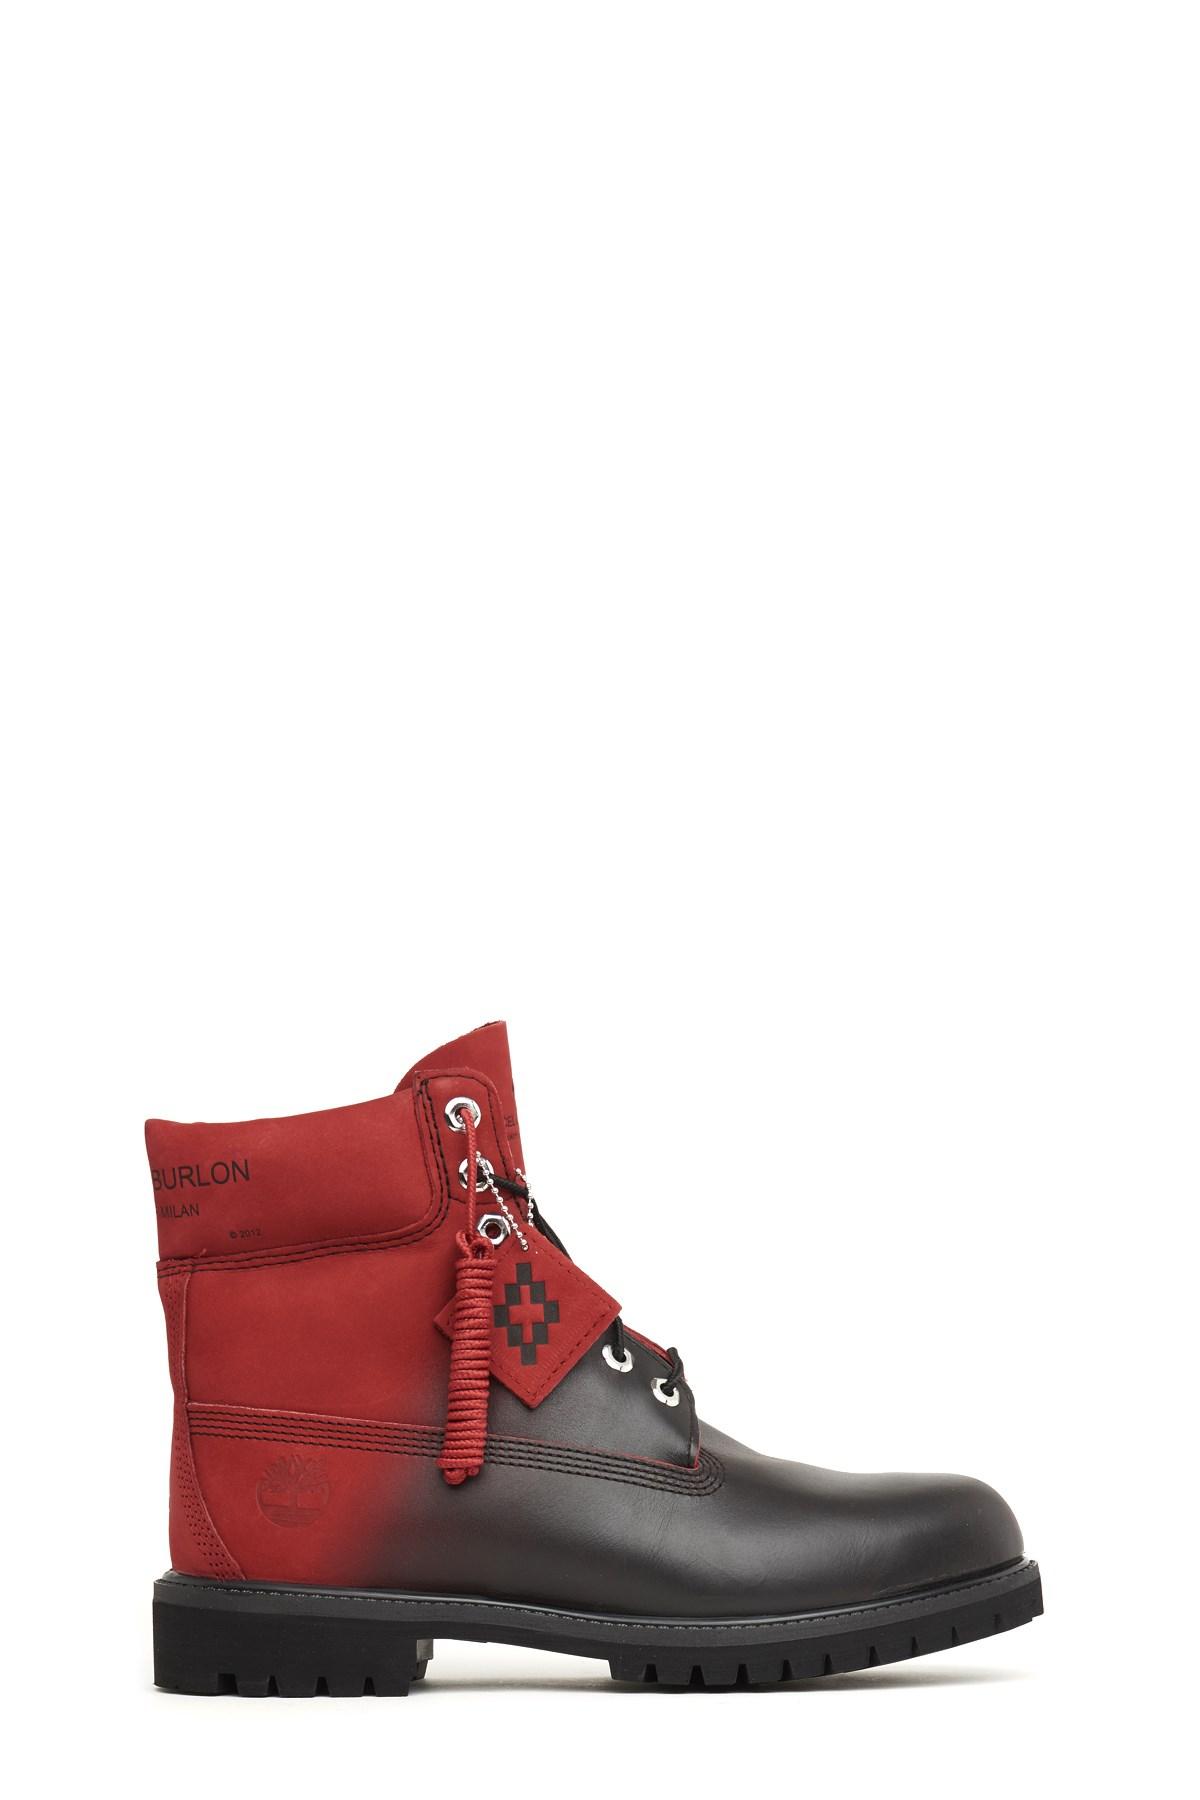 04ffa75734 MARCELO BURLON - COUNTY OF MILAN 'timberland' boots - COD.  CMIA074F1891612920882088